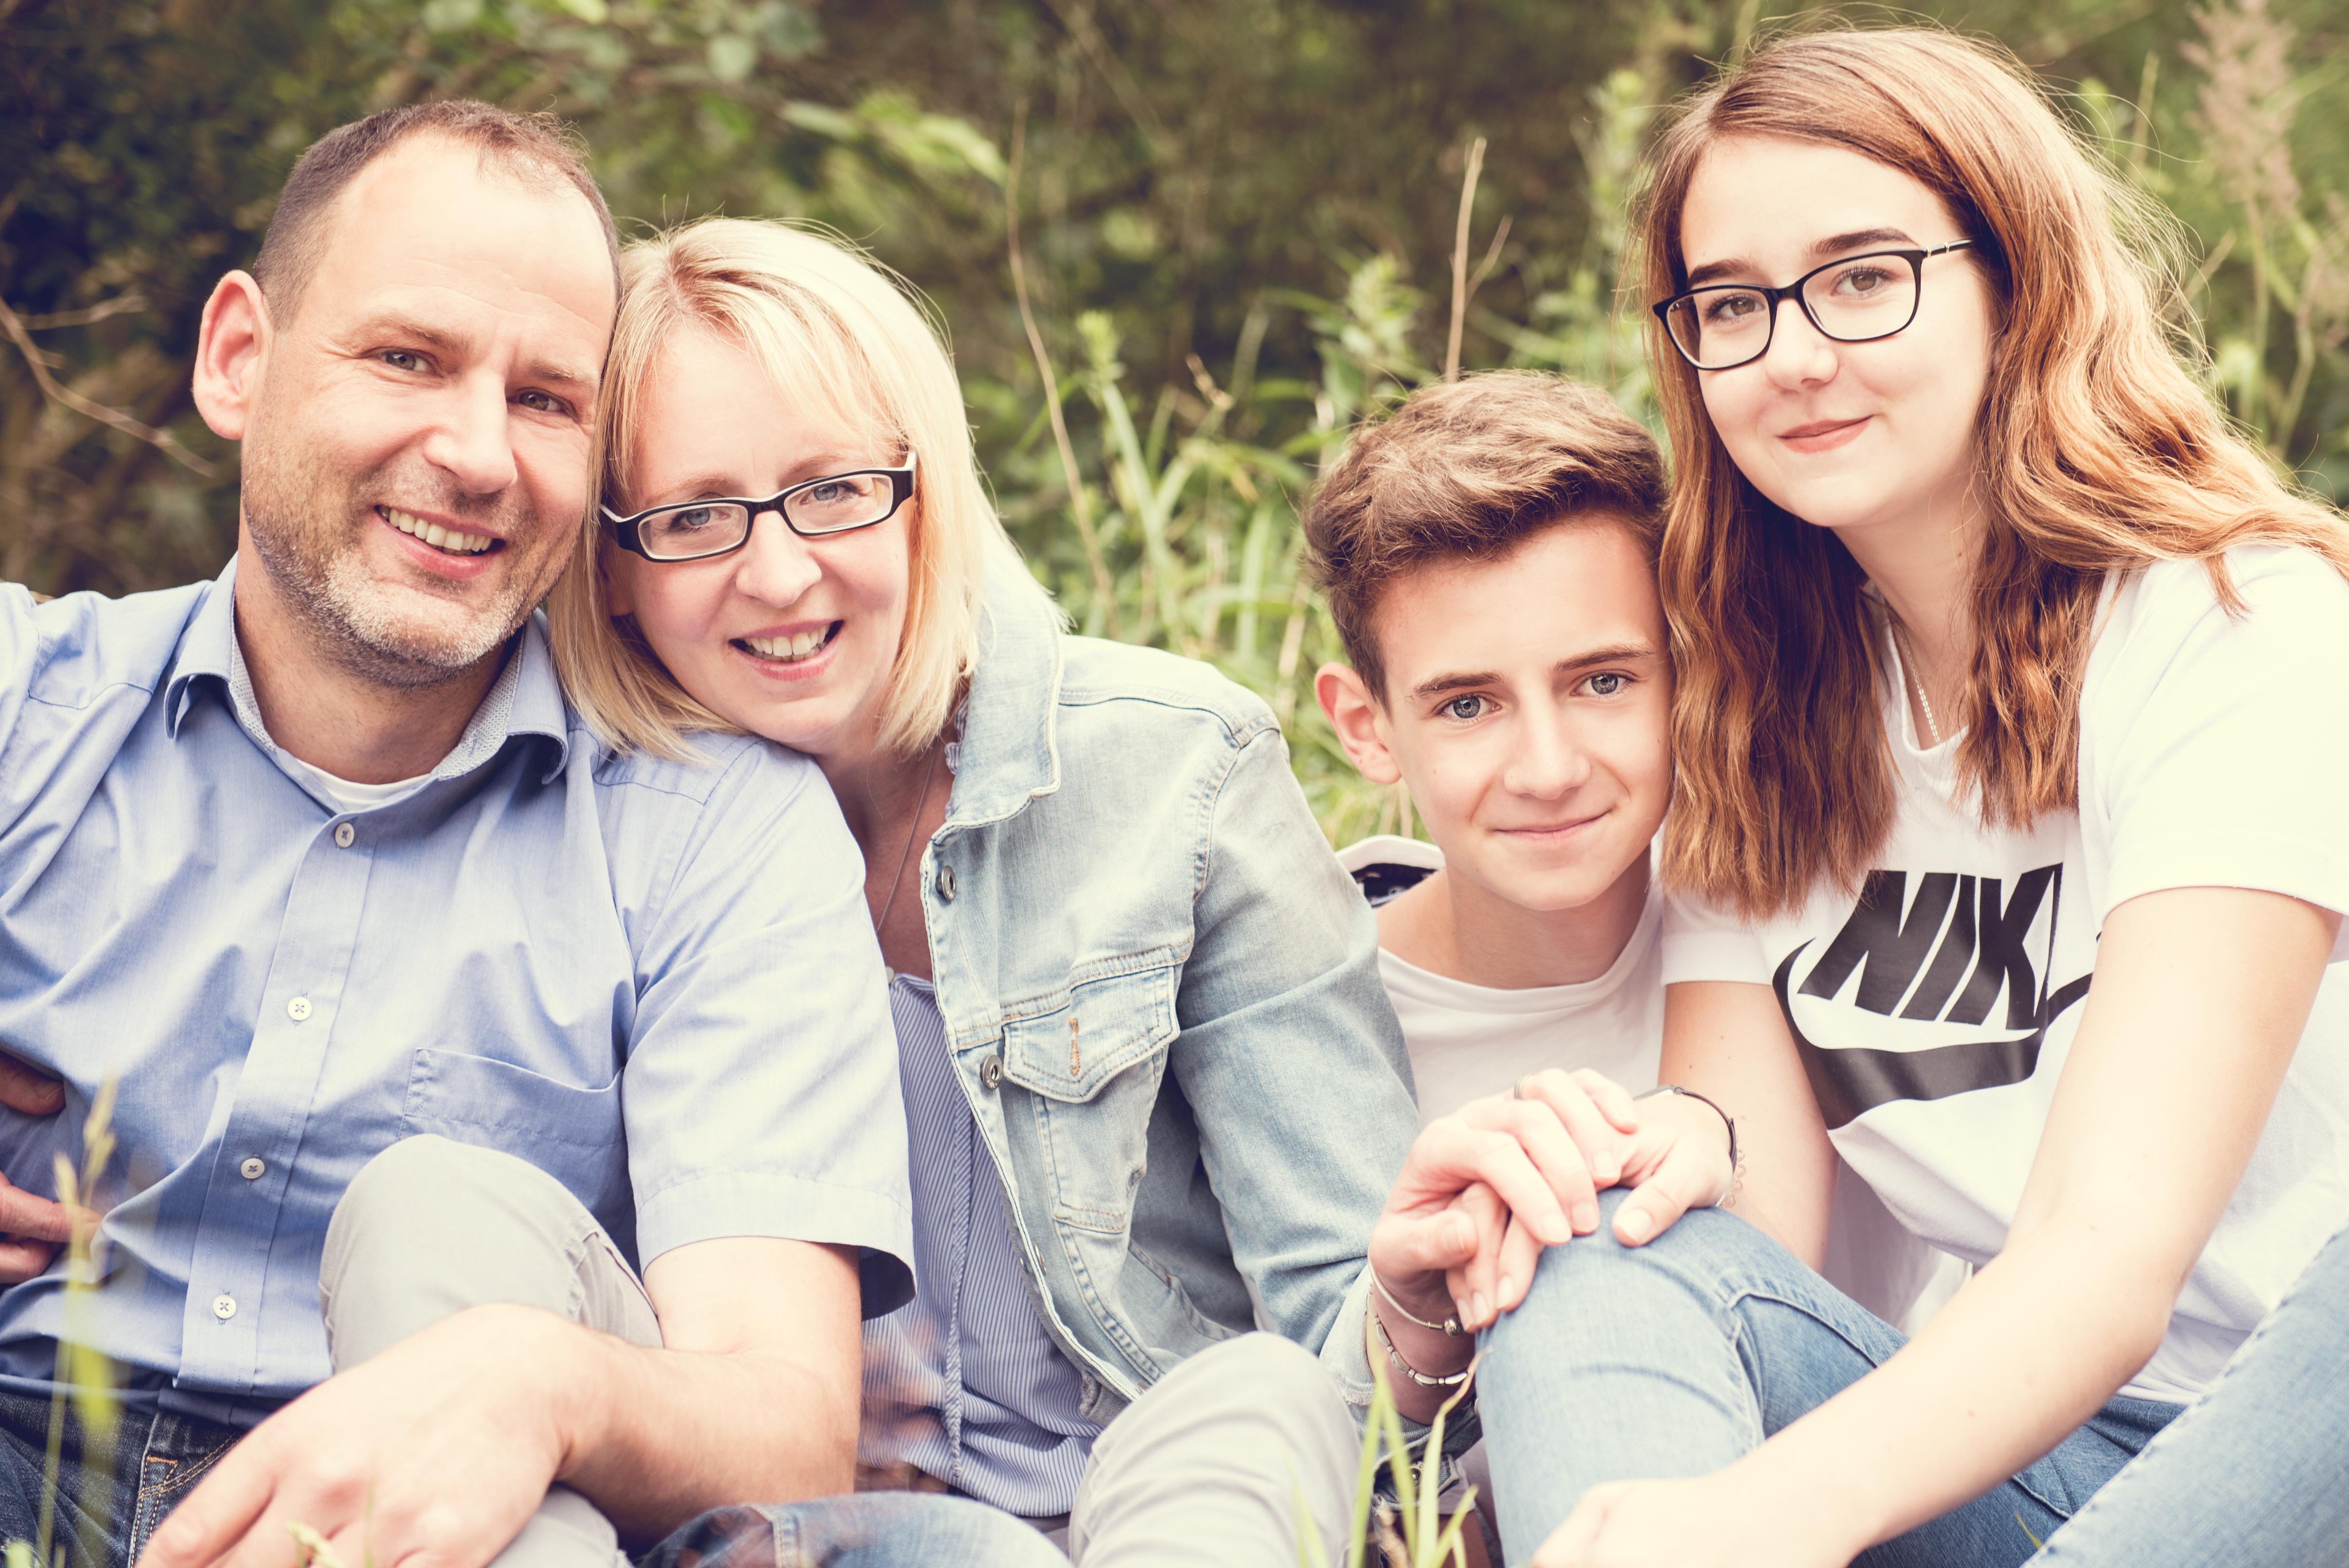 Familienshooting mit Teenagern